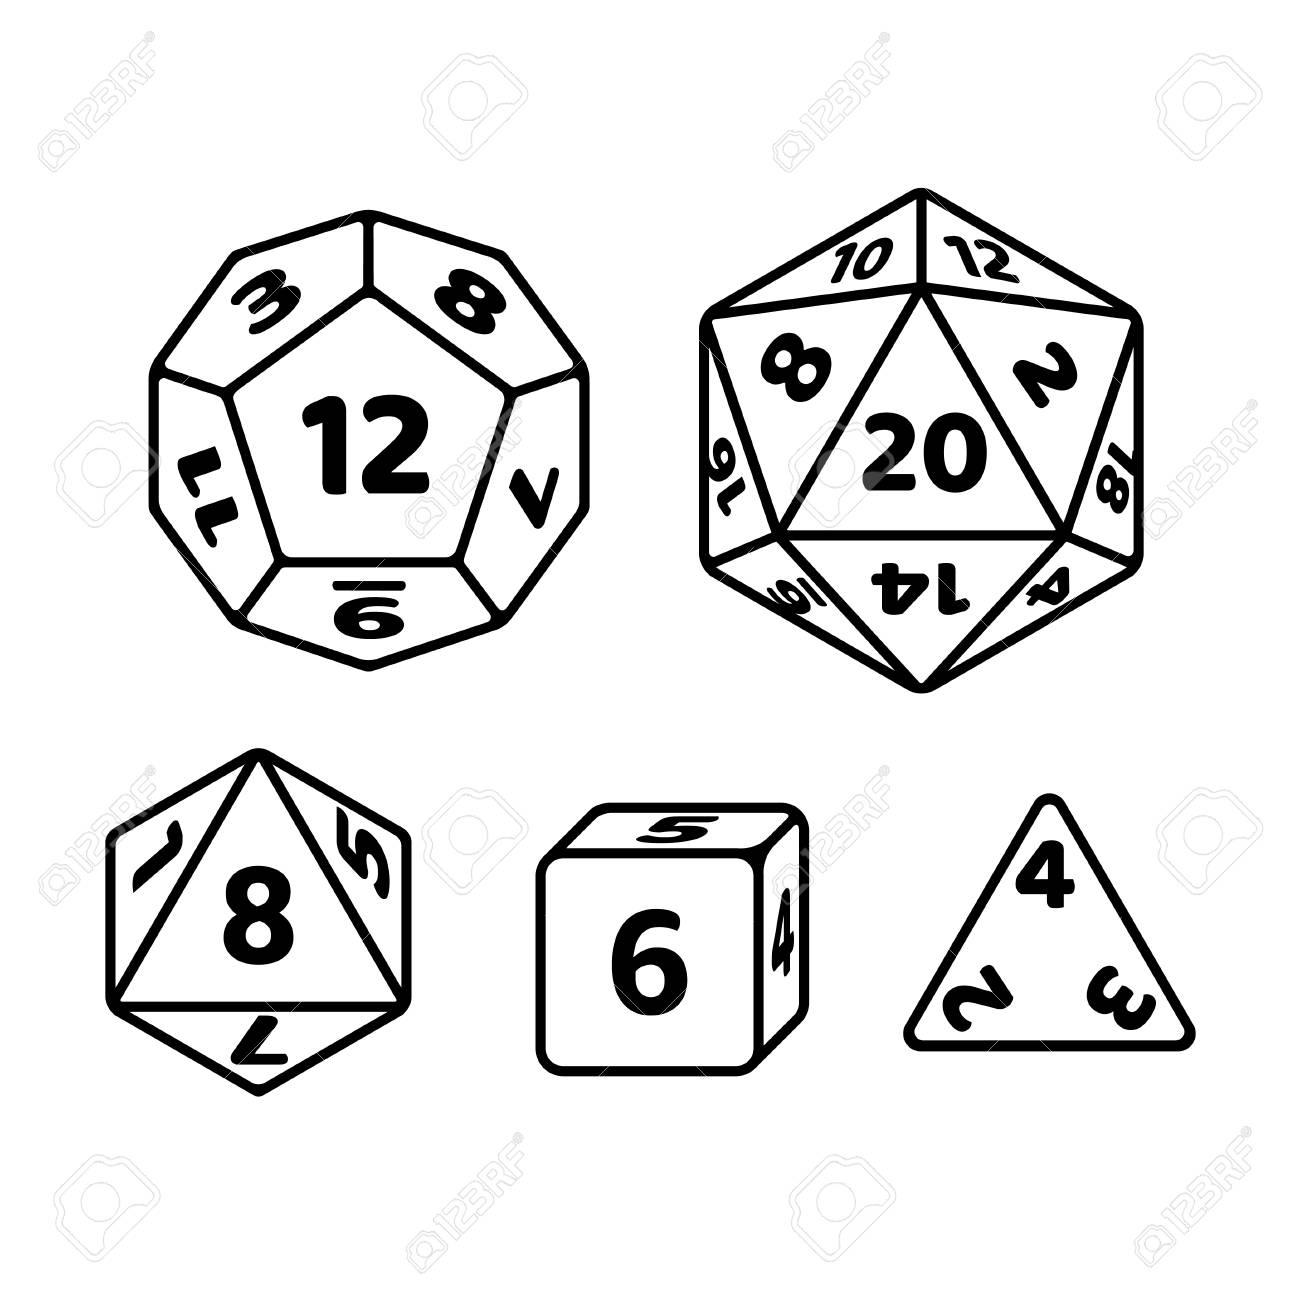 Set of polyhedron dice for fantasy RPG tabletop games. d20, d12,...